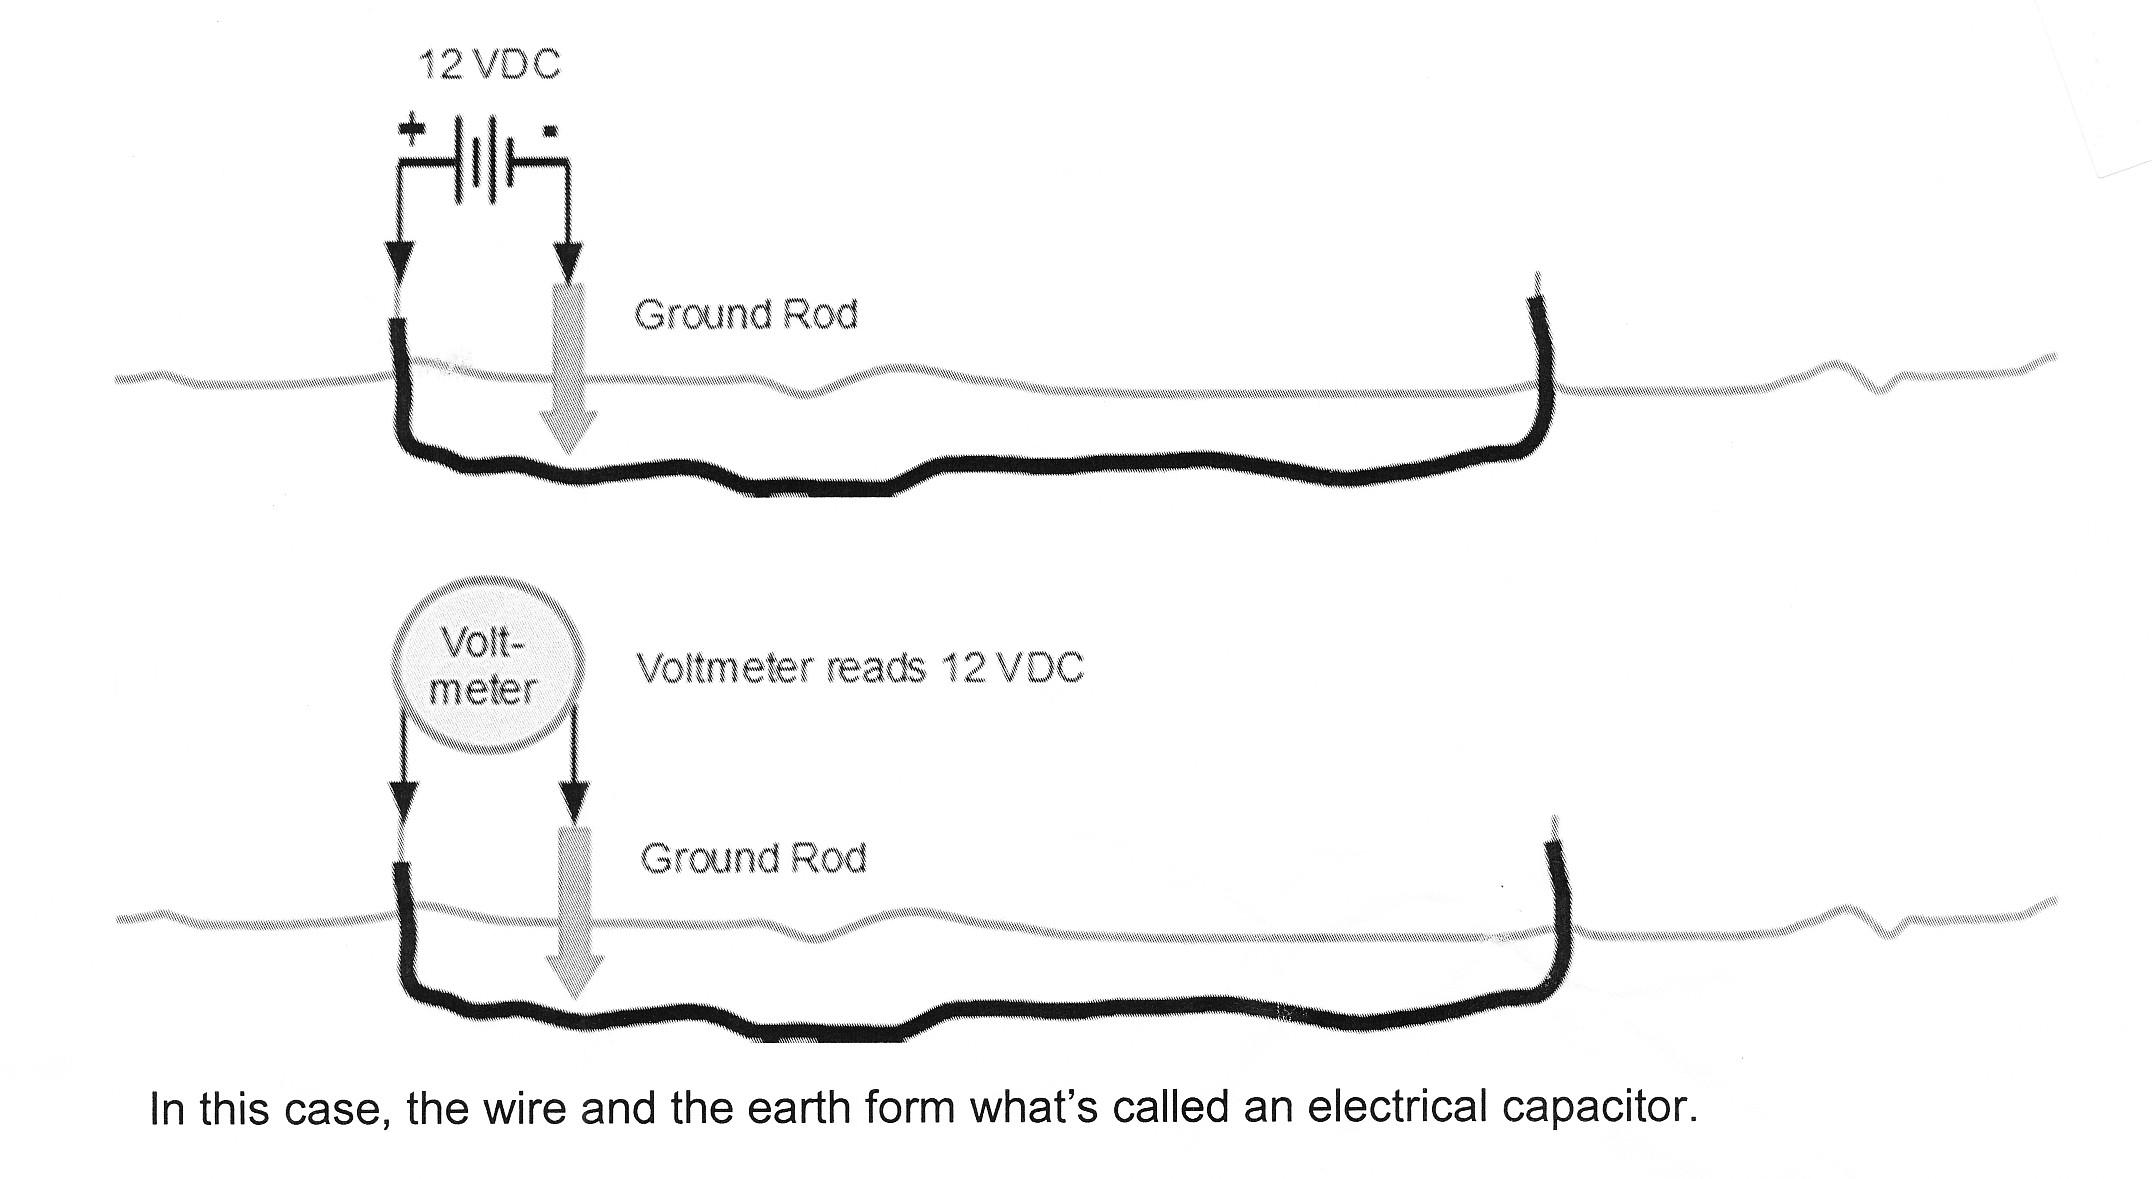 12VDC Voltmeter